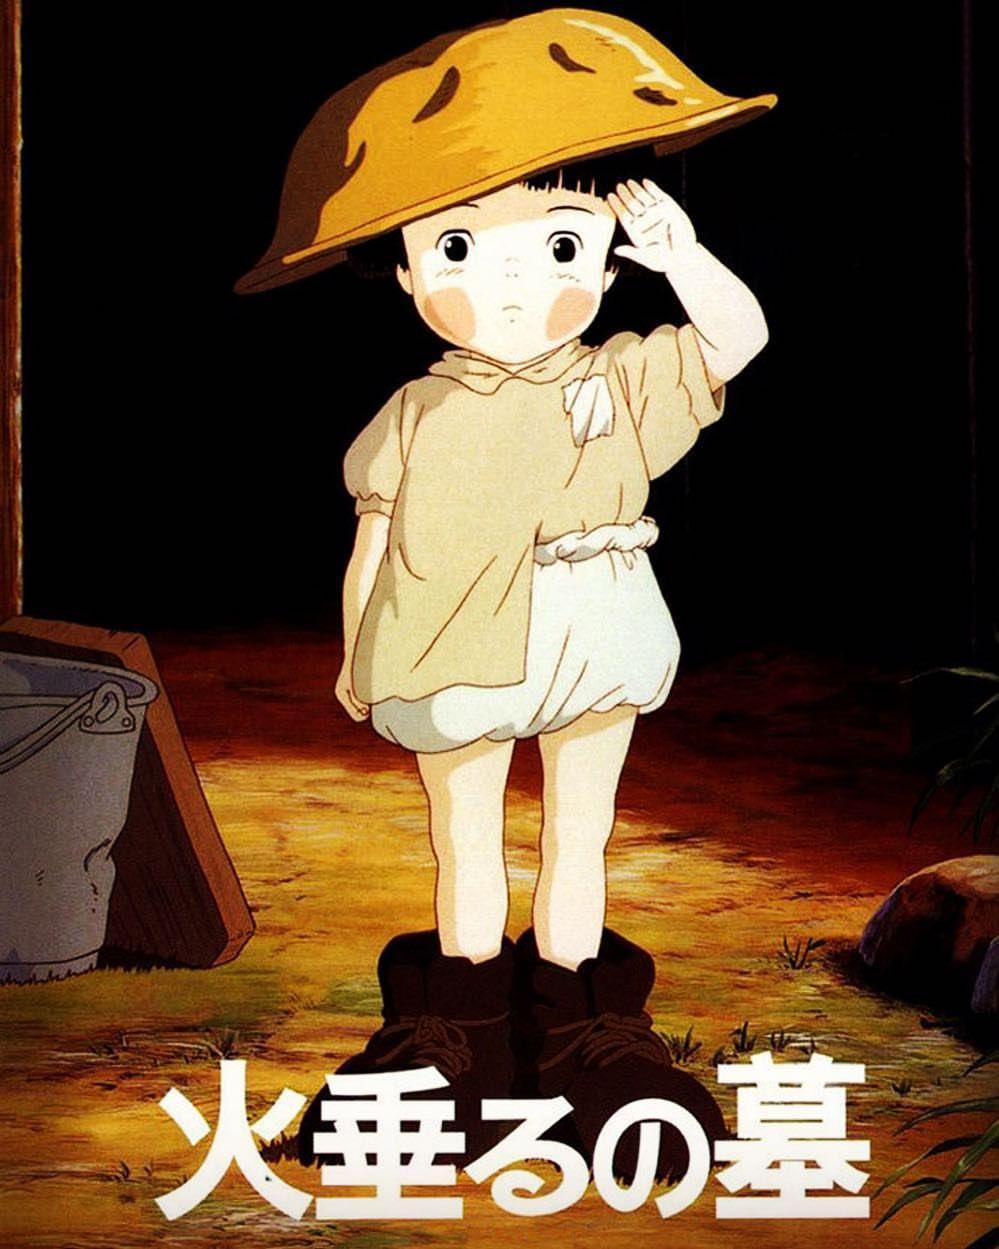 Hideo KojimaさんはInstagramを利用しています「火垂るの墓 高畑勲」 火垂るの墓, 戦争